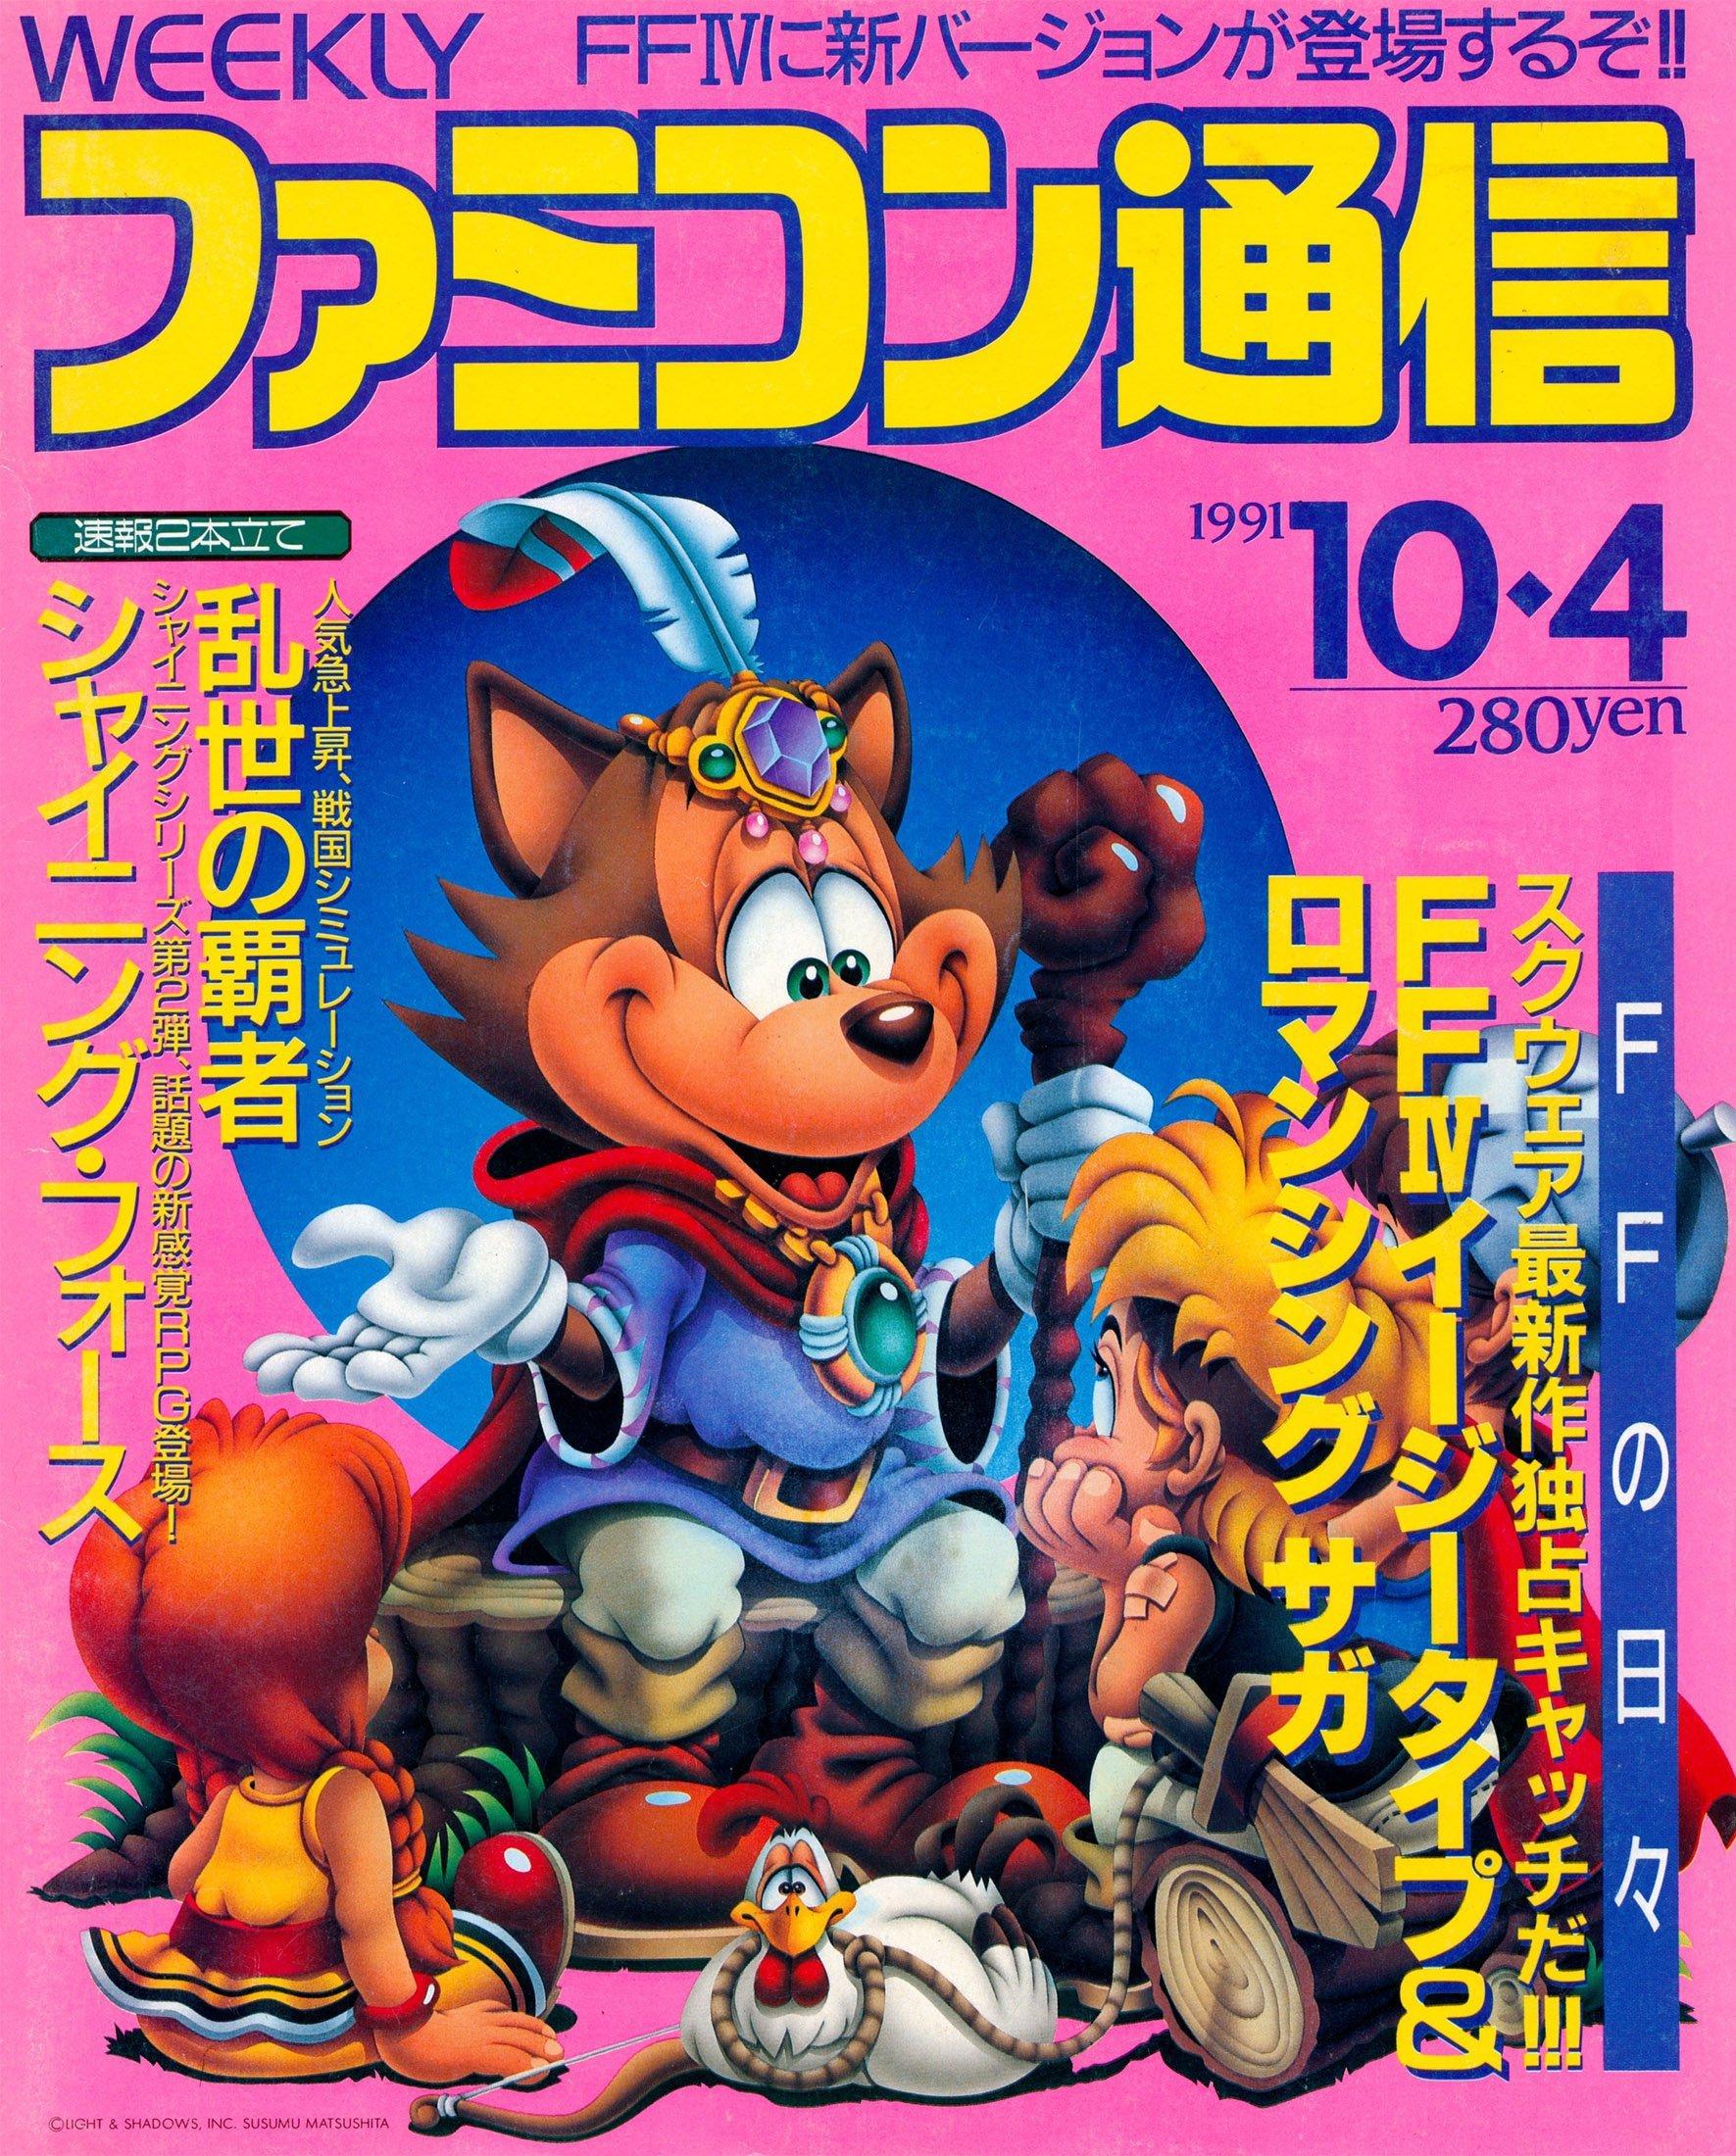 Famitsu 0146 (October 4, 1991)